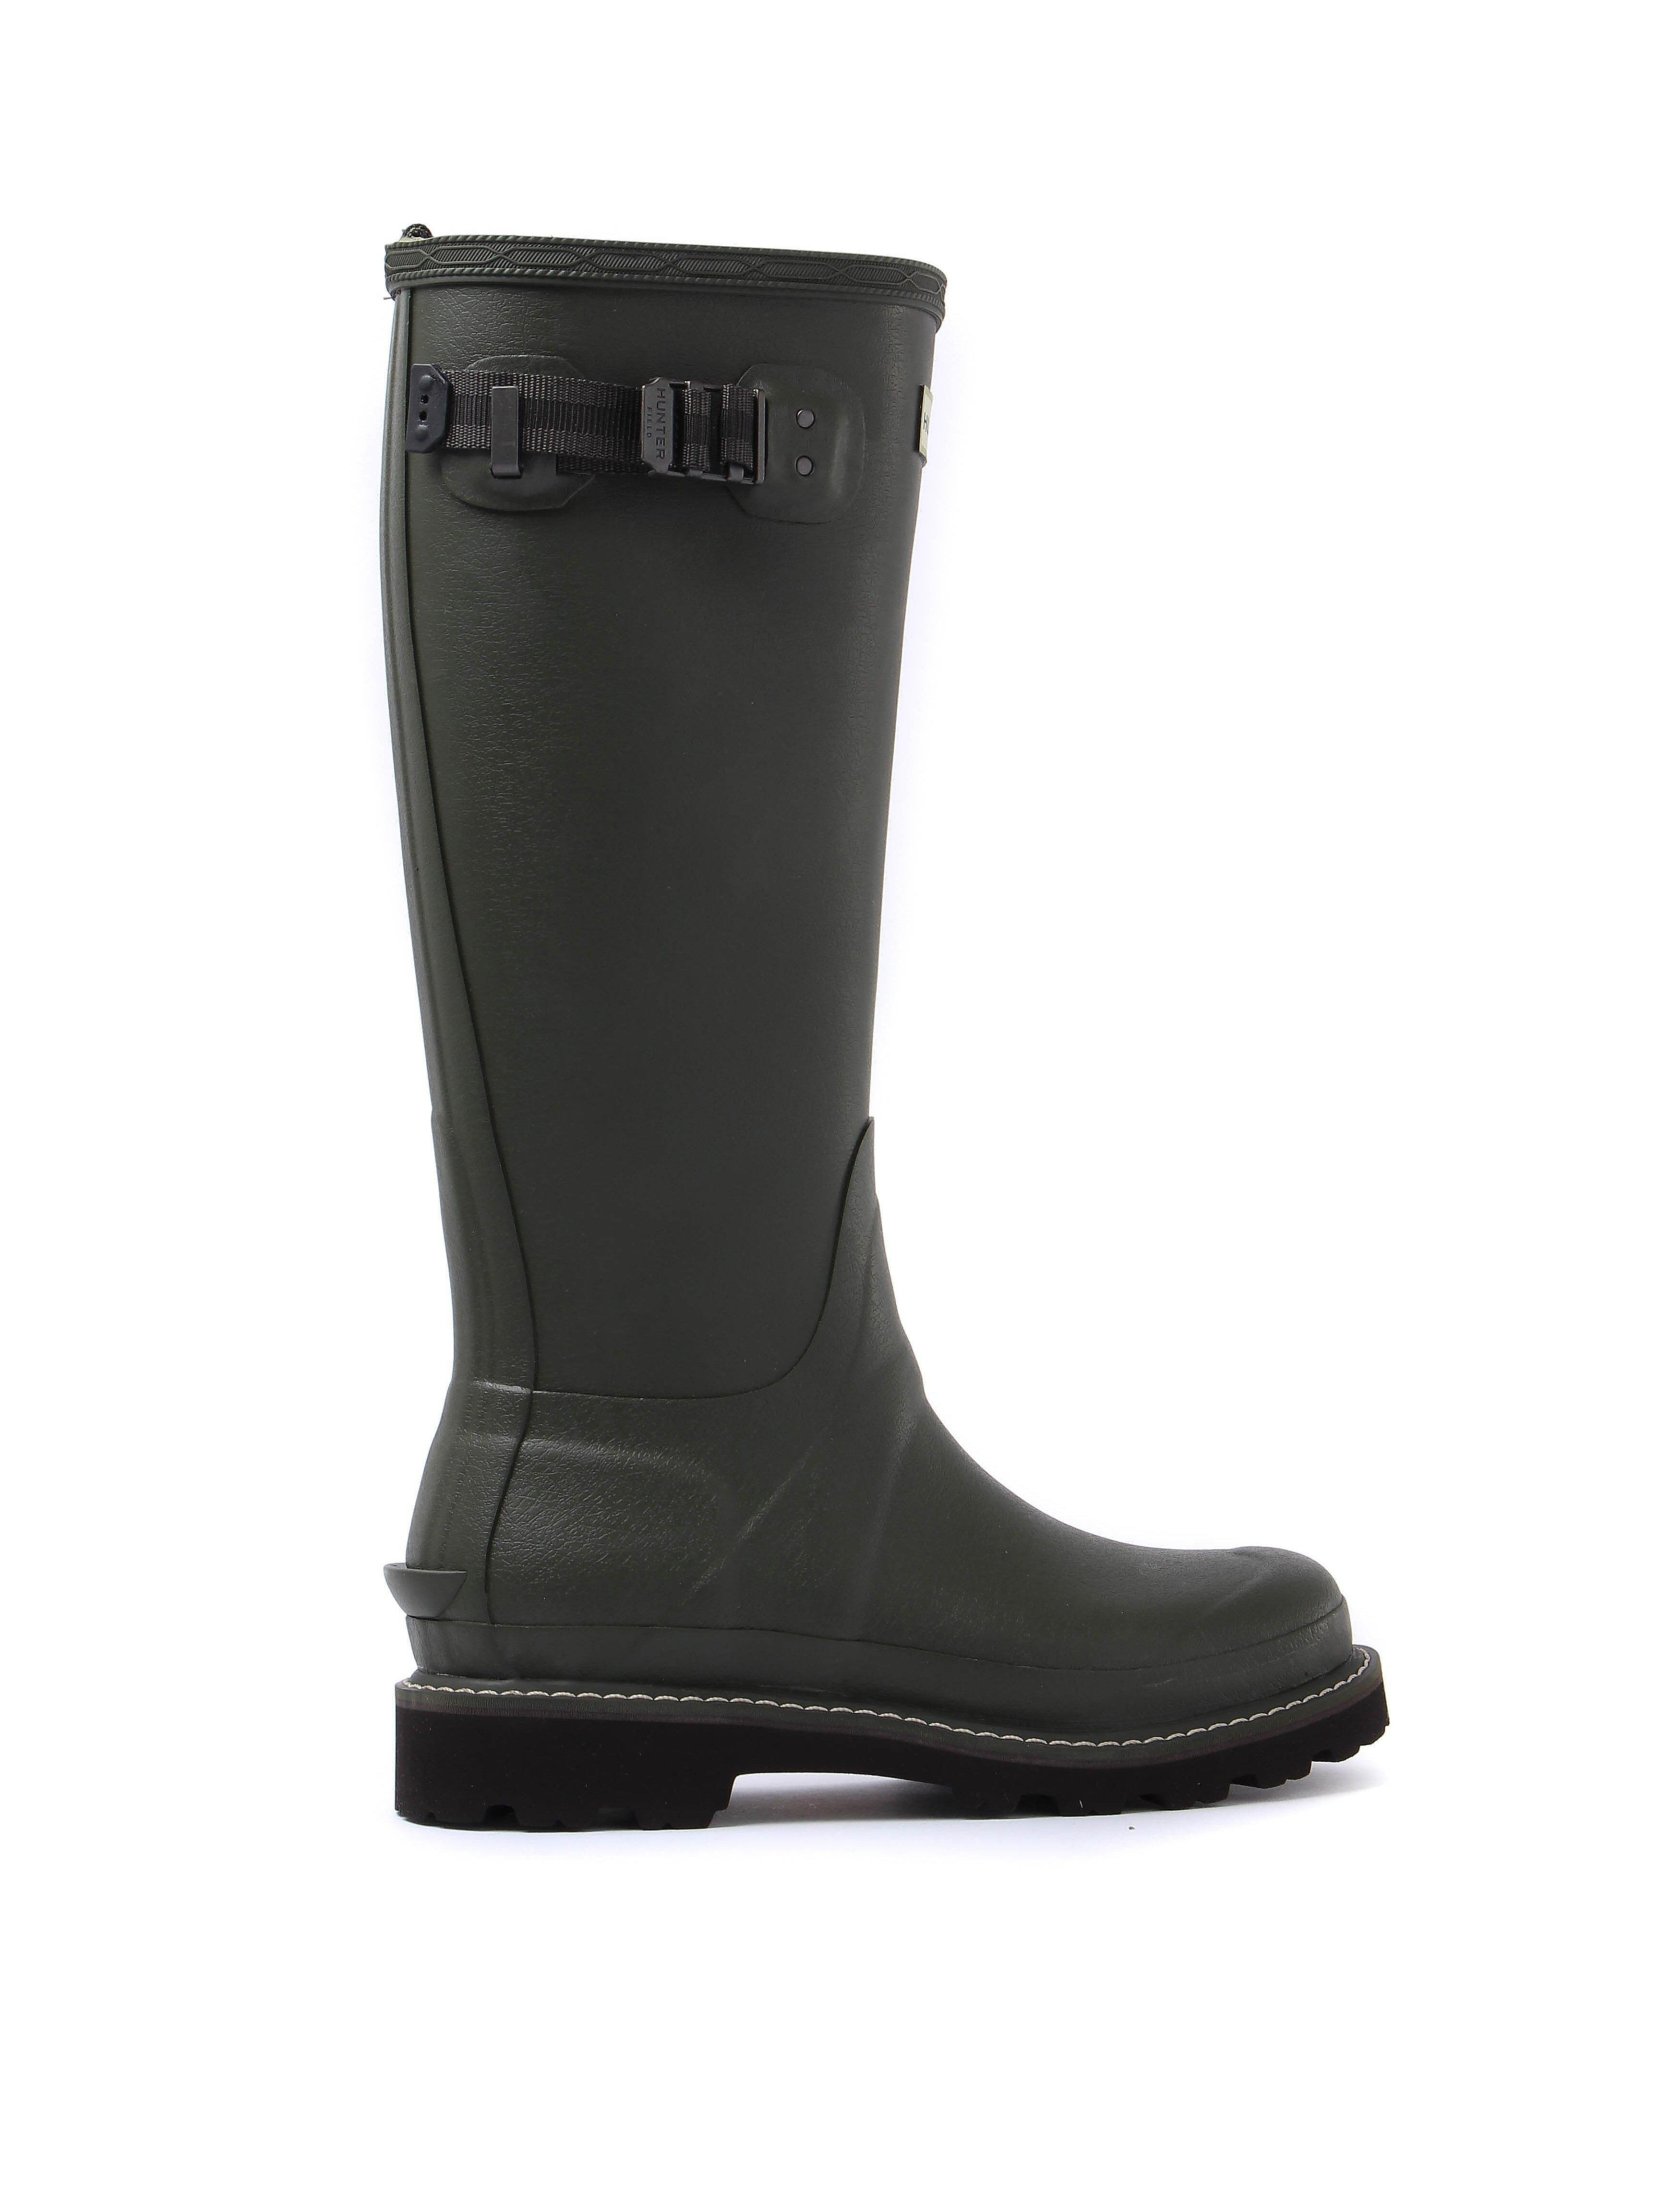 Hunter Wellies Women's Balmoral II Adjustable Wellington Boots - Dark Olive